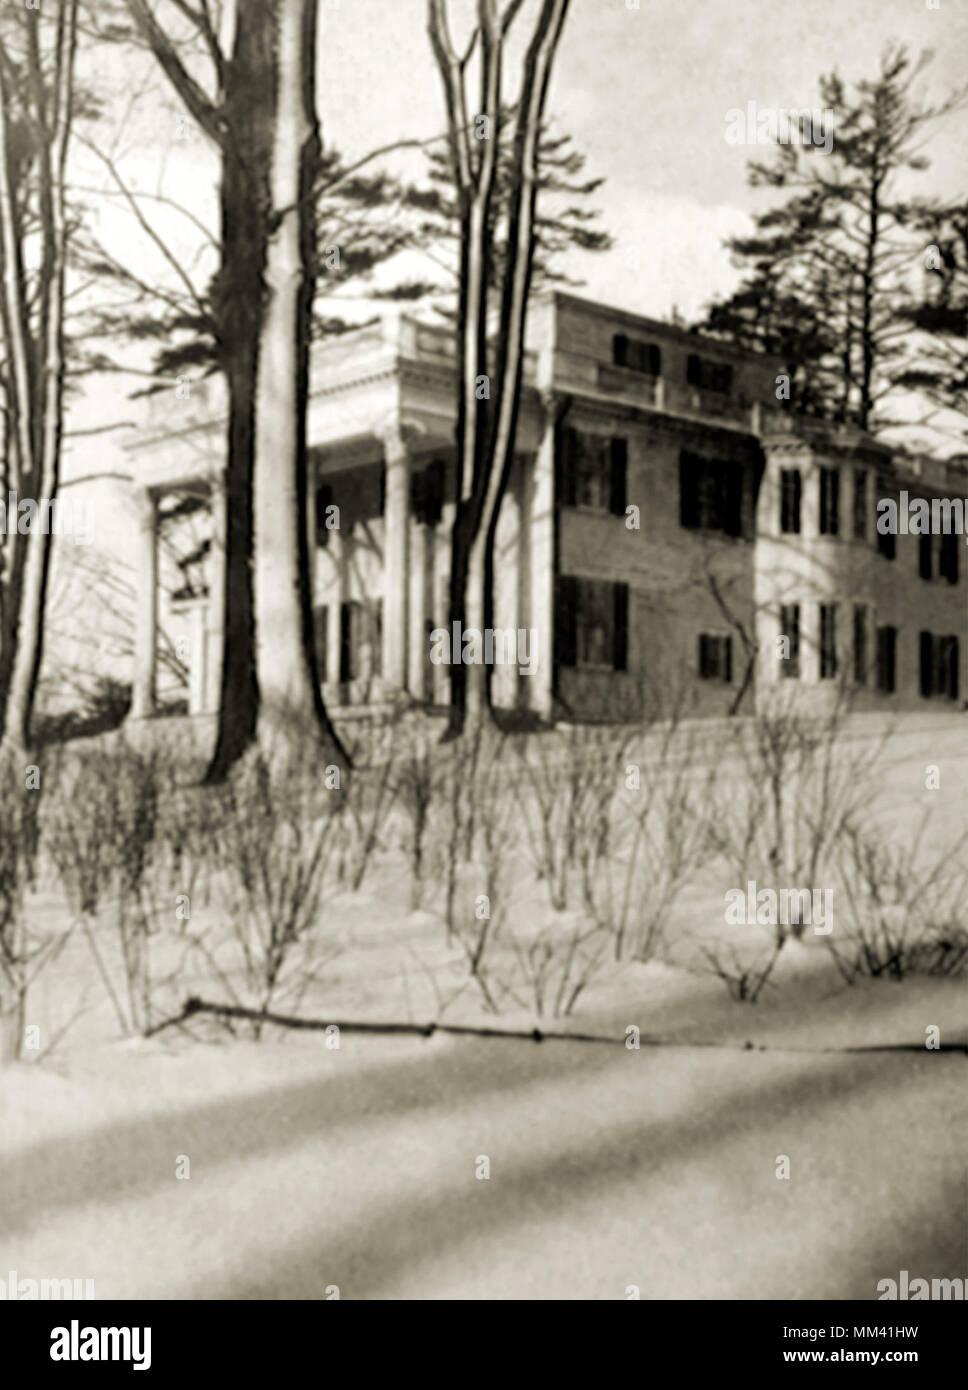 Lame Building at Hospital. West Roxbury. 1921 - Stock Image